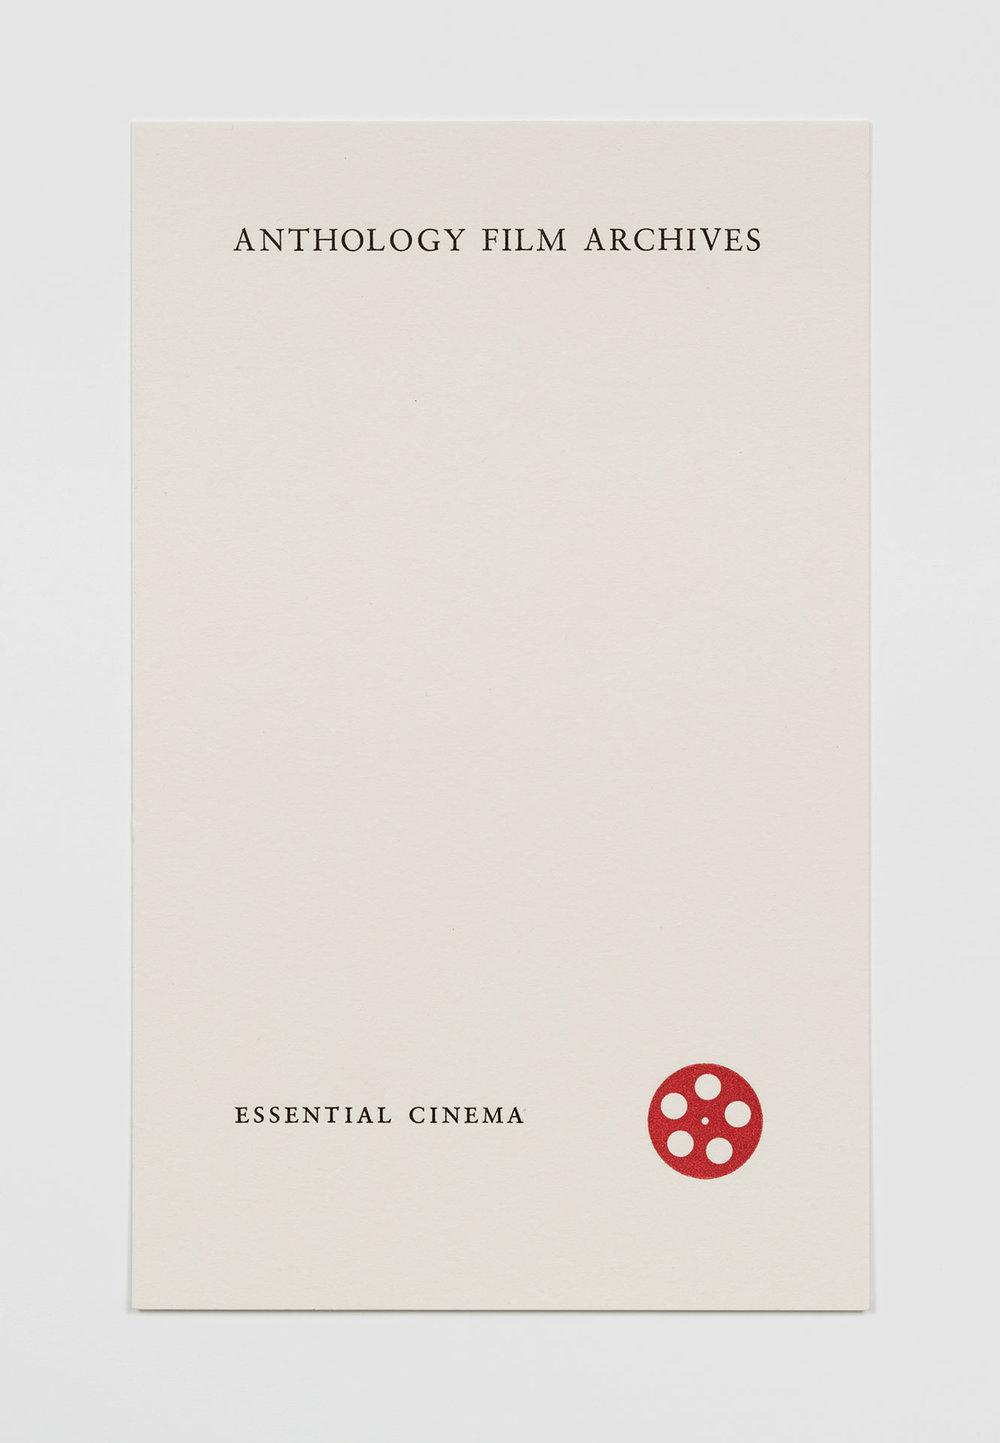 Card for Anthology Film Archives.